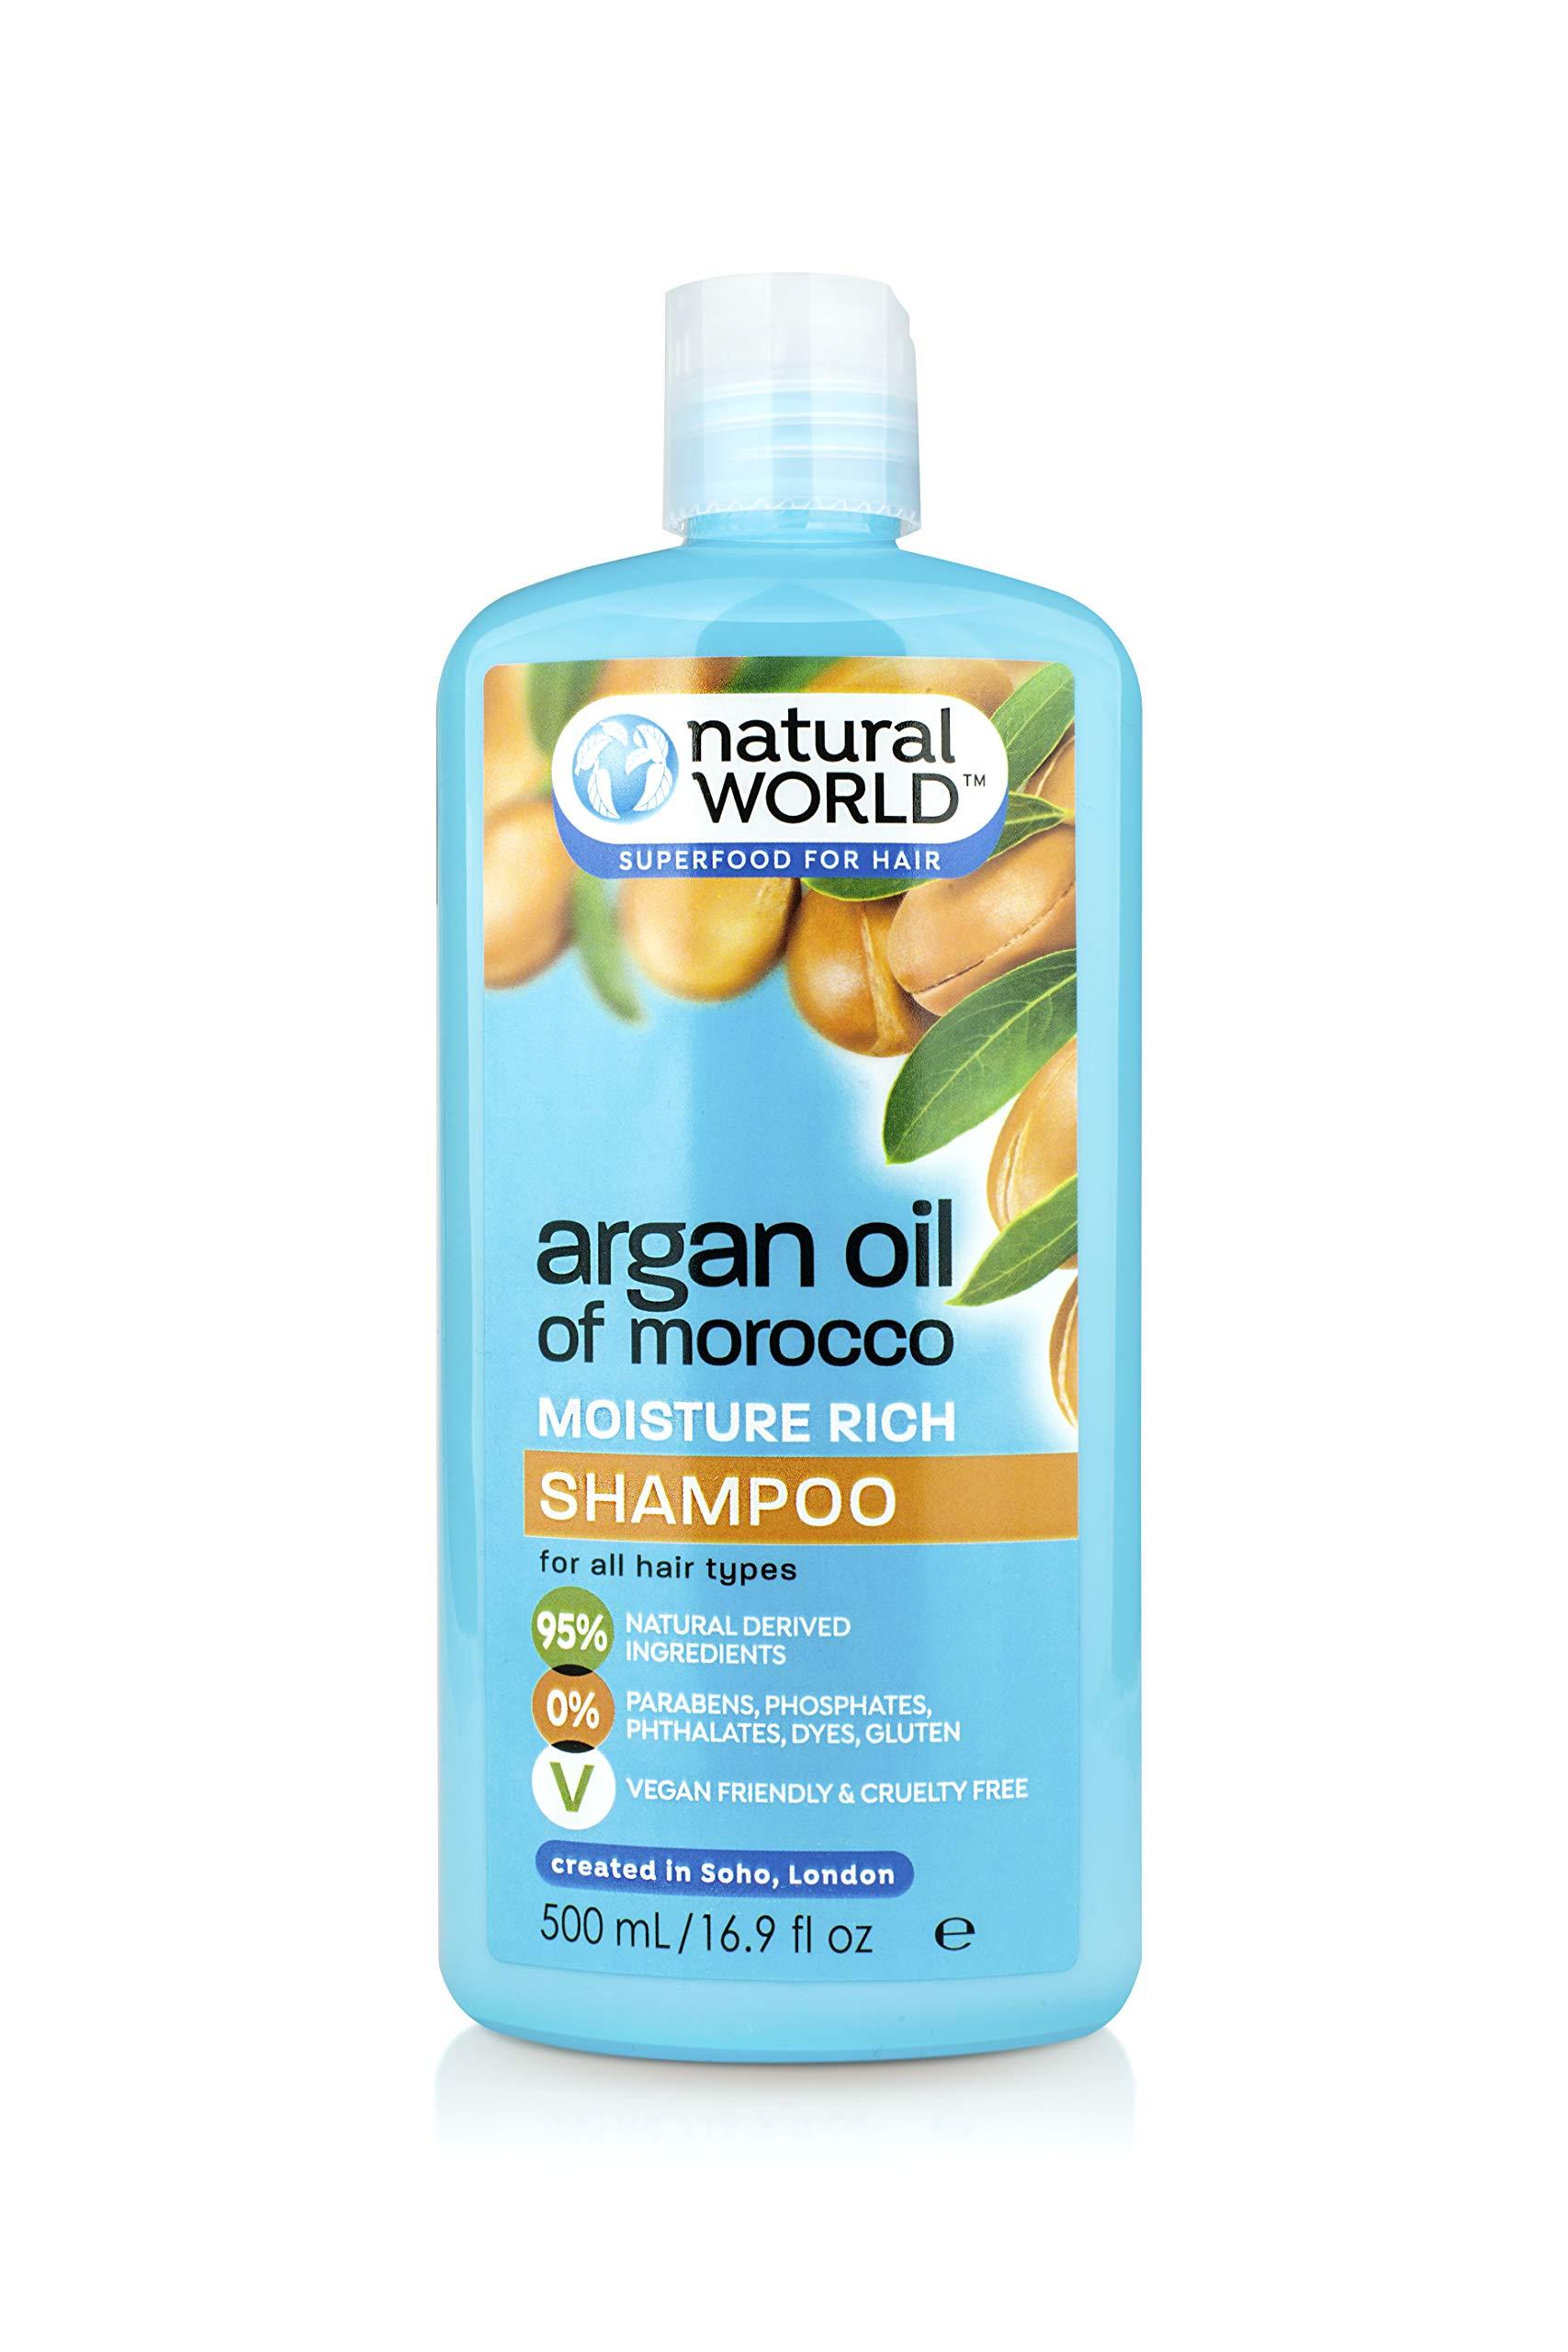 Natural World Moroccan Argan Oil Moisture Rich Shampoo 500ml